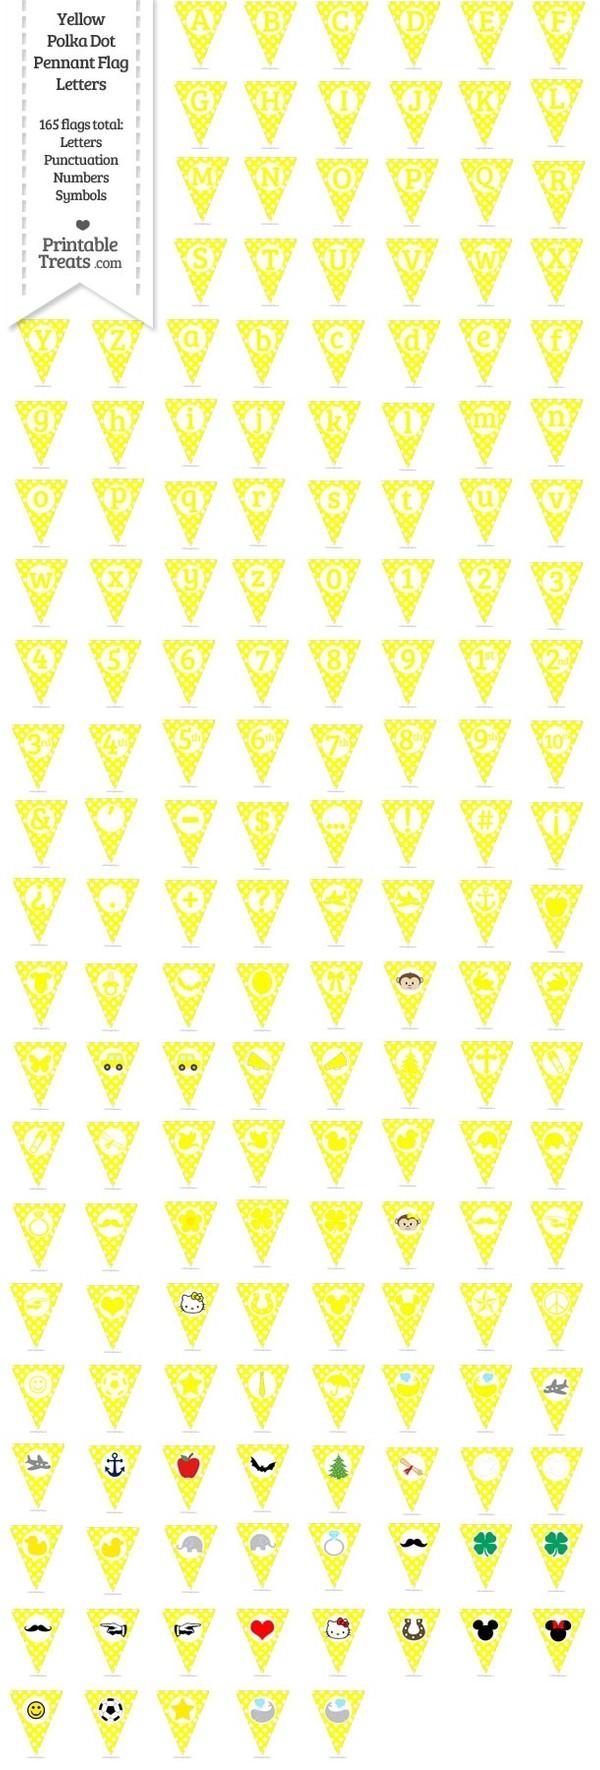 165 Yellow Polka Dot Pennant Flag Letters Password